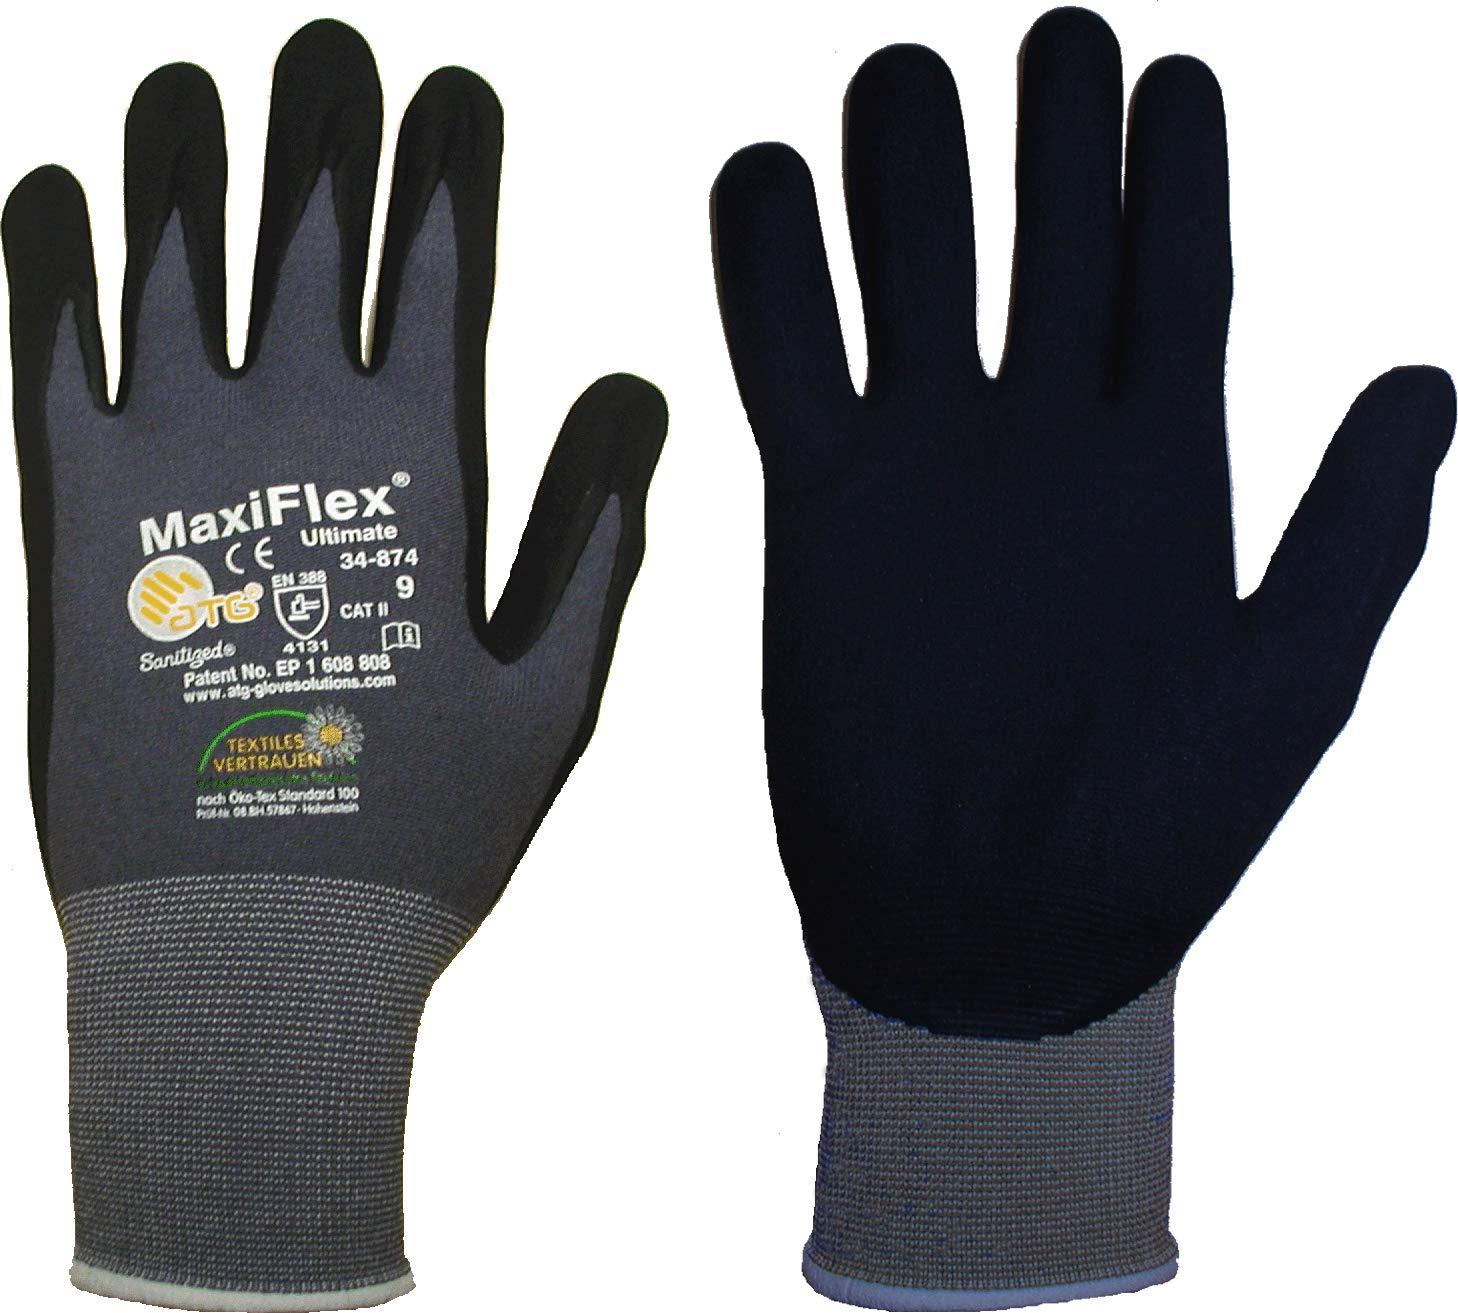 Gr/ö/ße:XXL 10er Pack MaxiFlex Ultimate 34-874 Arbeitshandschuhe Montagehandschuhe